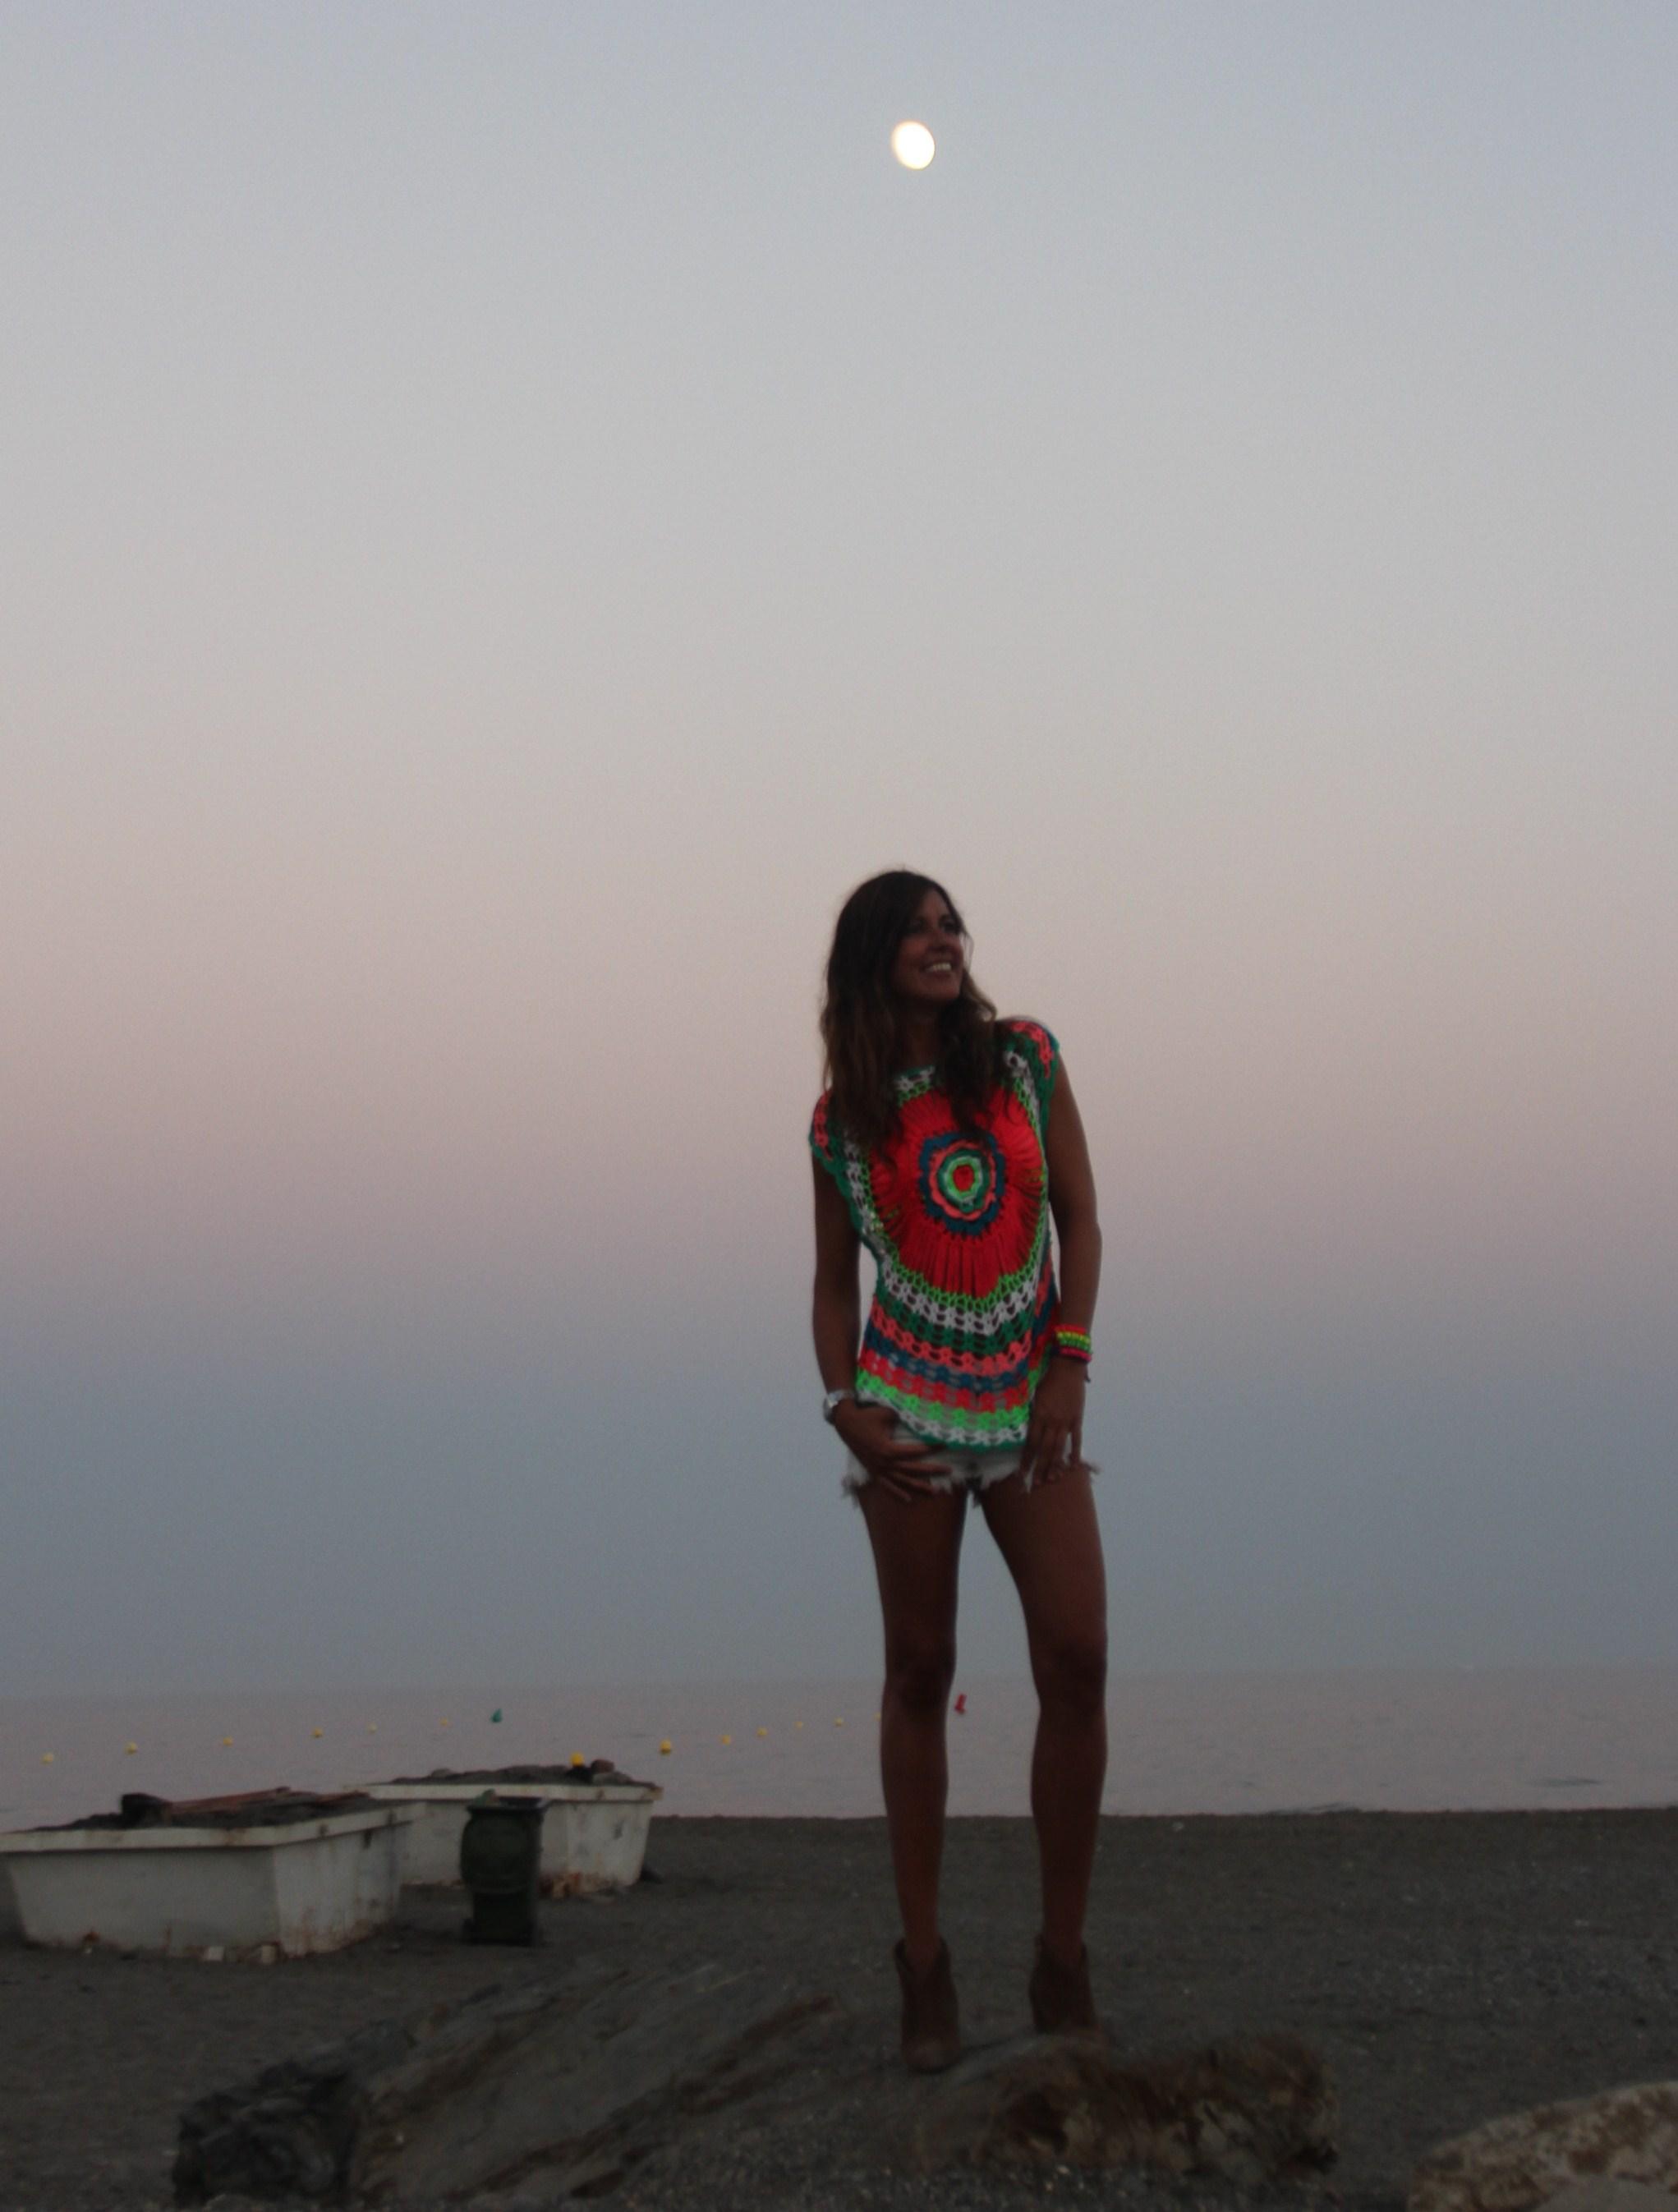 summer sunset-57166-mytenida